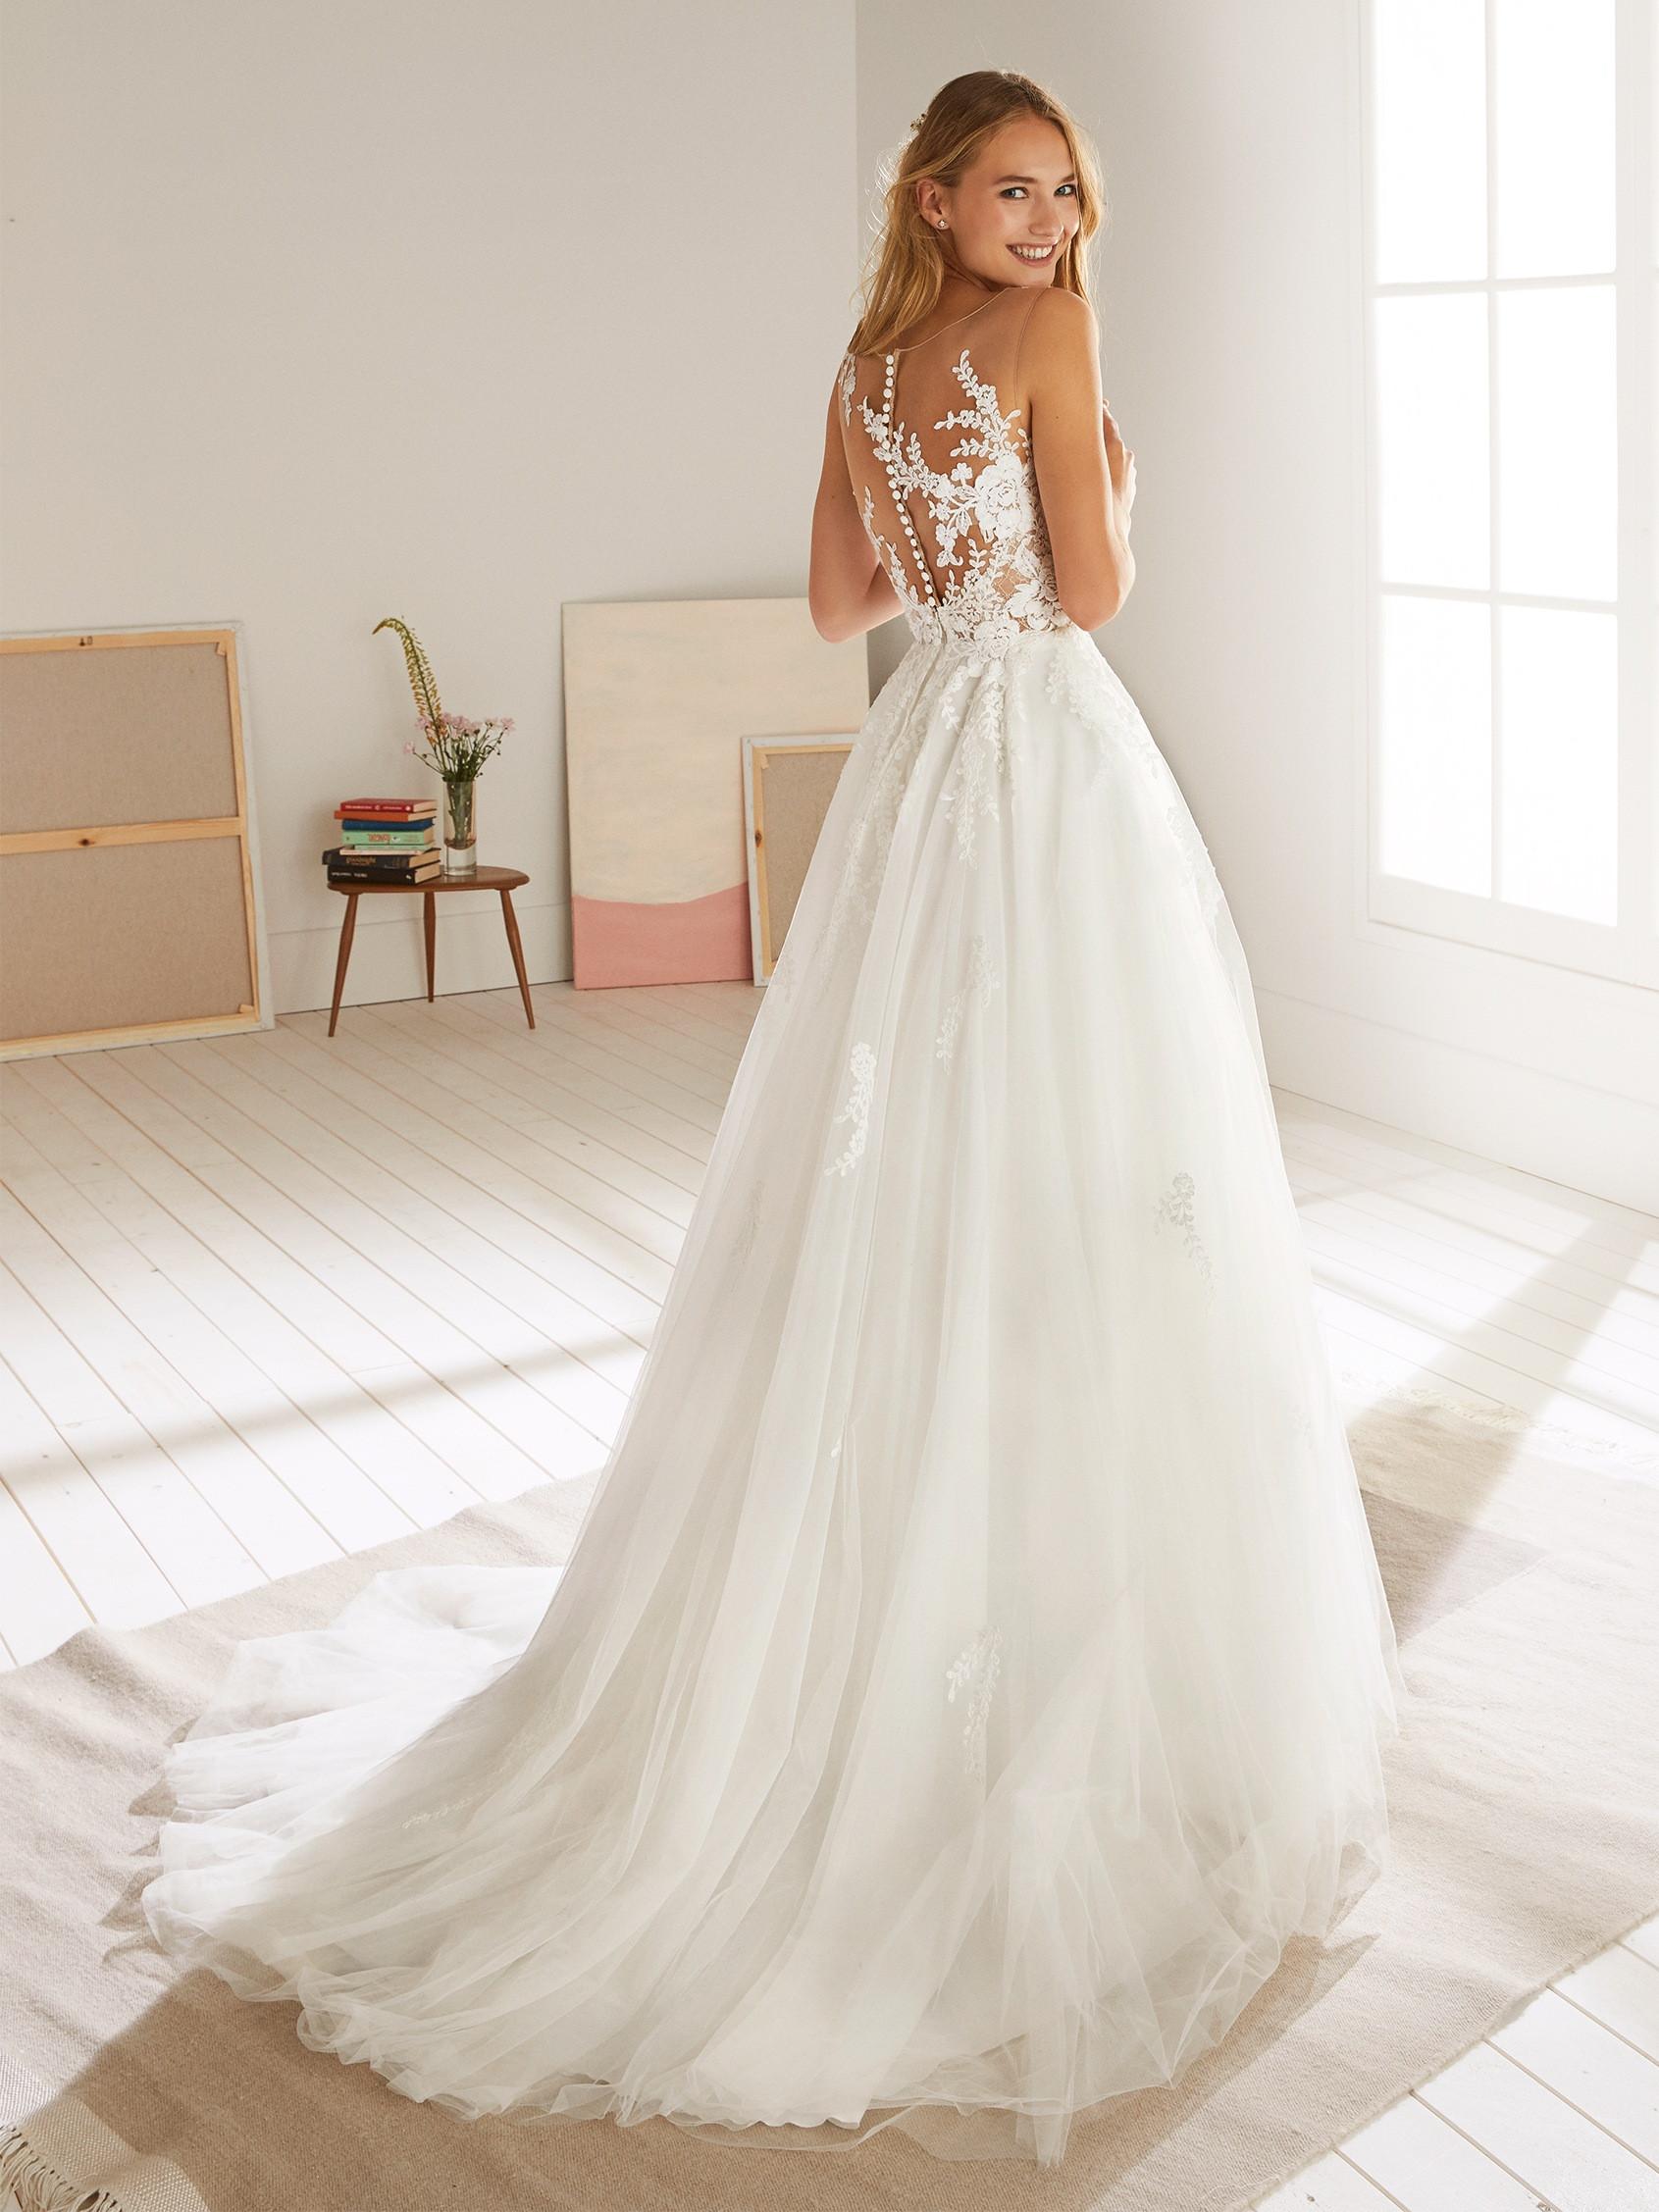 OROPESA-White-One-Couture-Closet